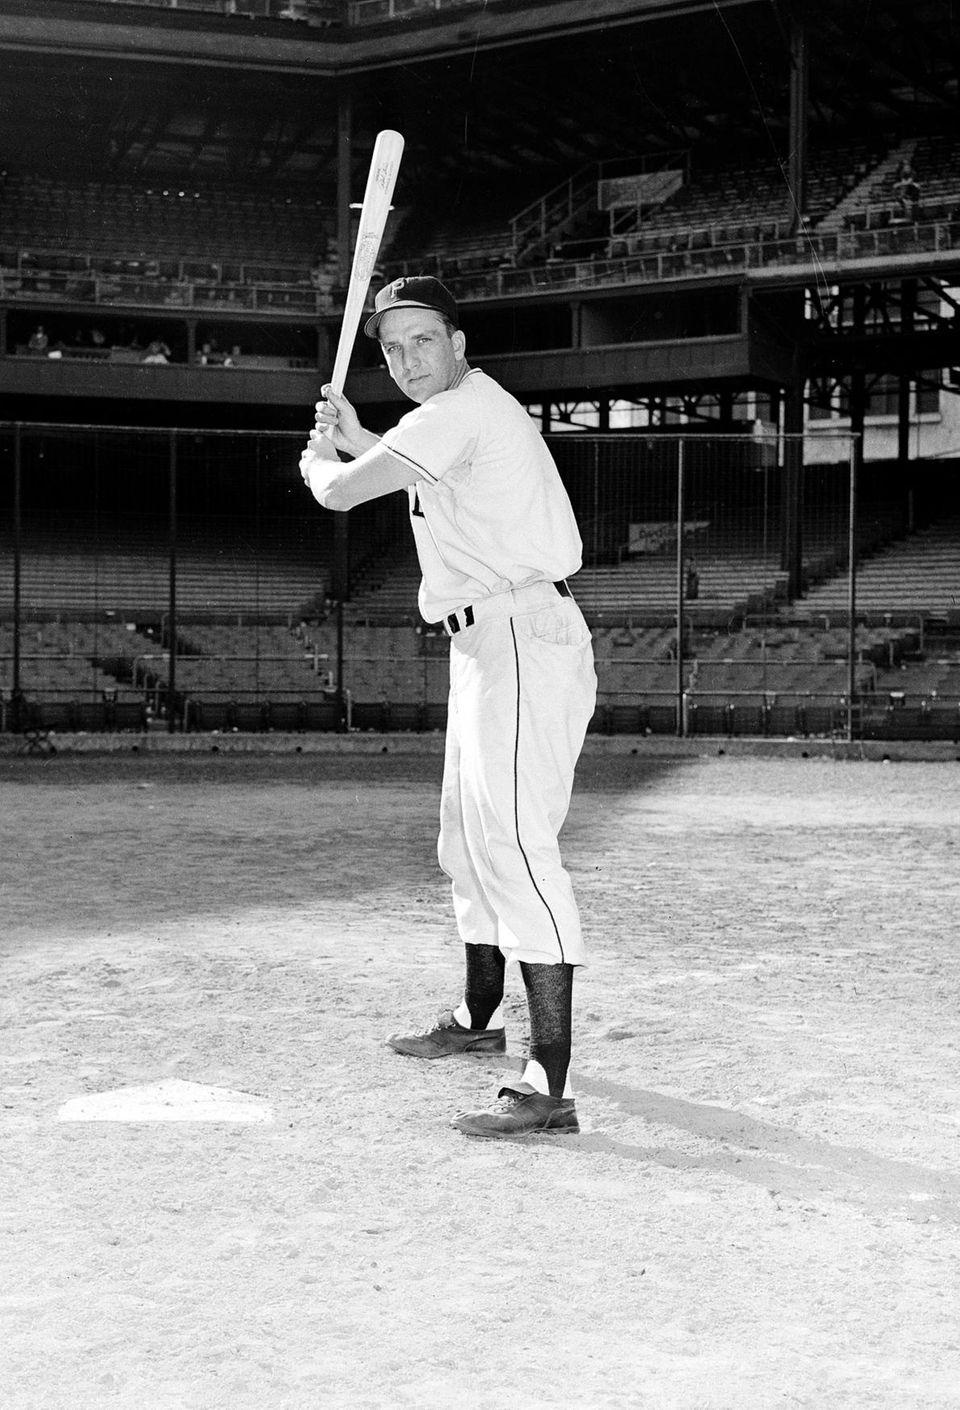 RALPH KINER 1949, Pittsburgh Pirates 54 home runs